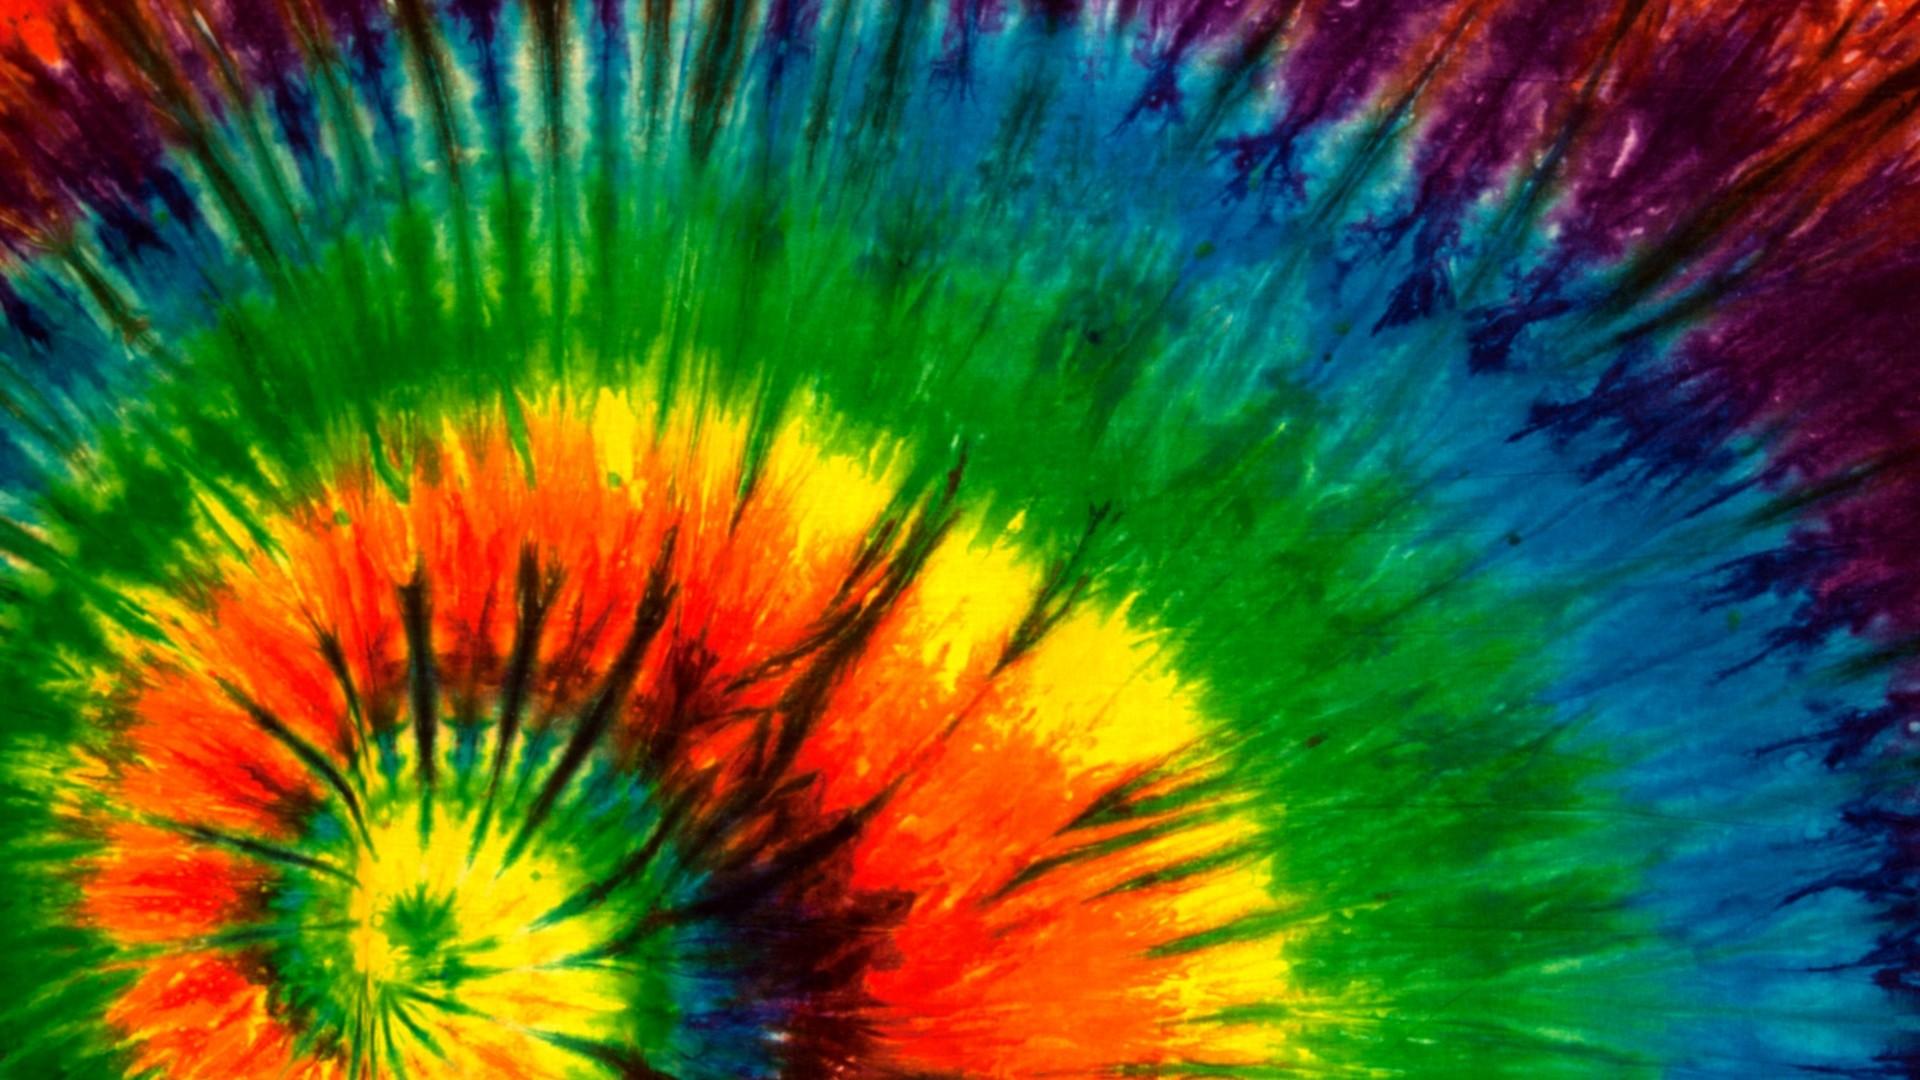 … trippy wallpapers pictures images; 12 hippie desktop wallpapers  wppsource …